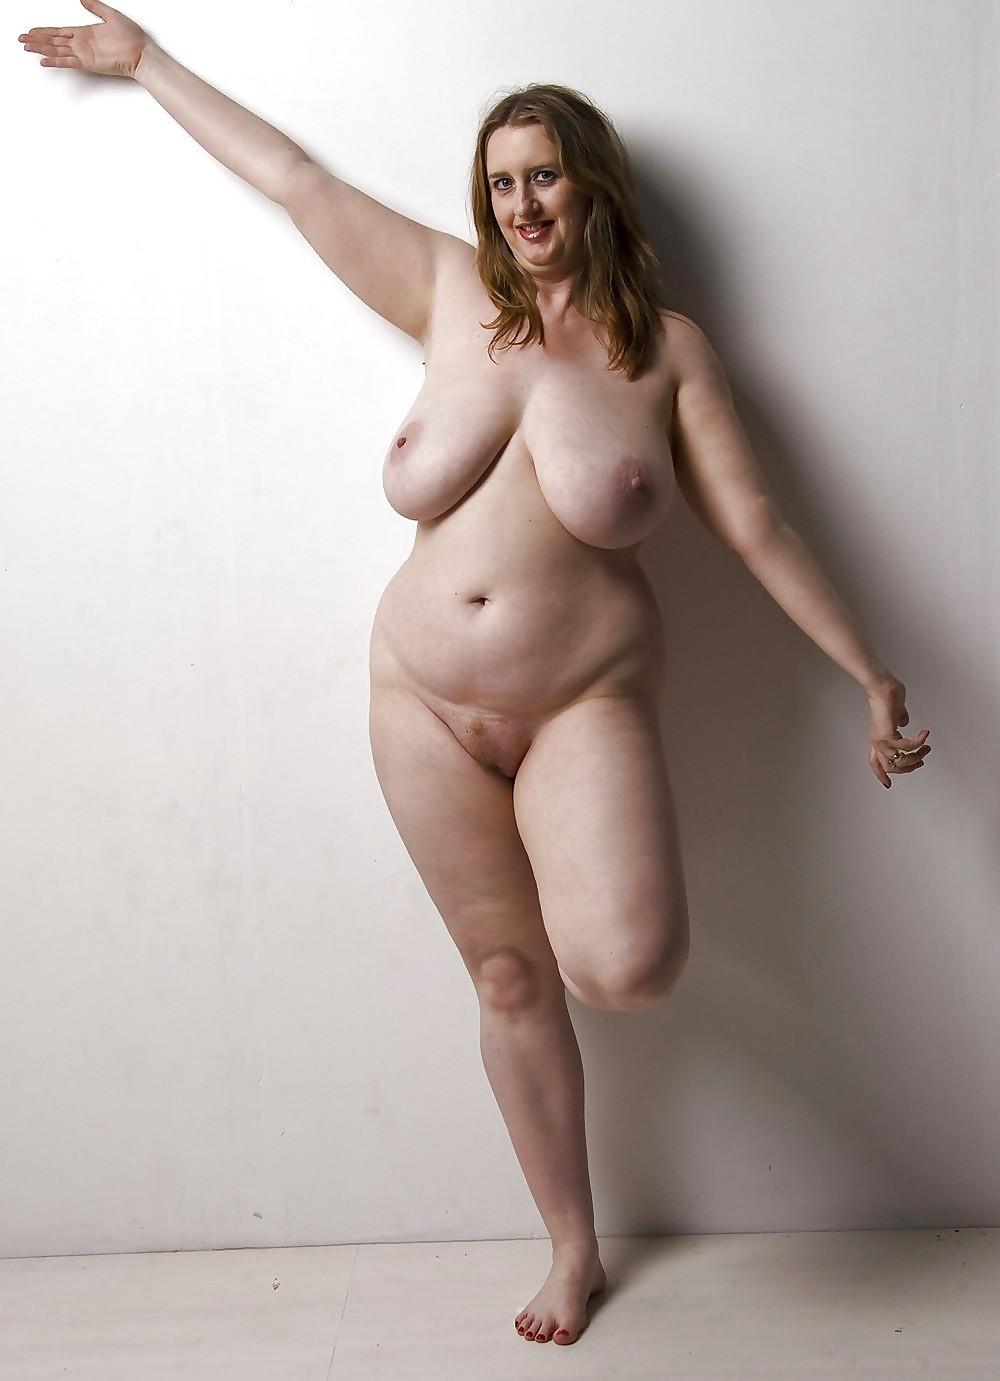 Erotic Image Free handjob galleries